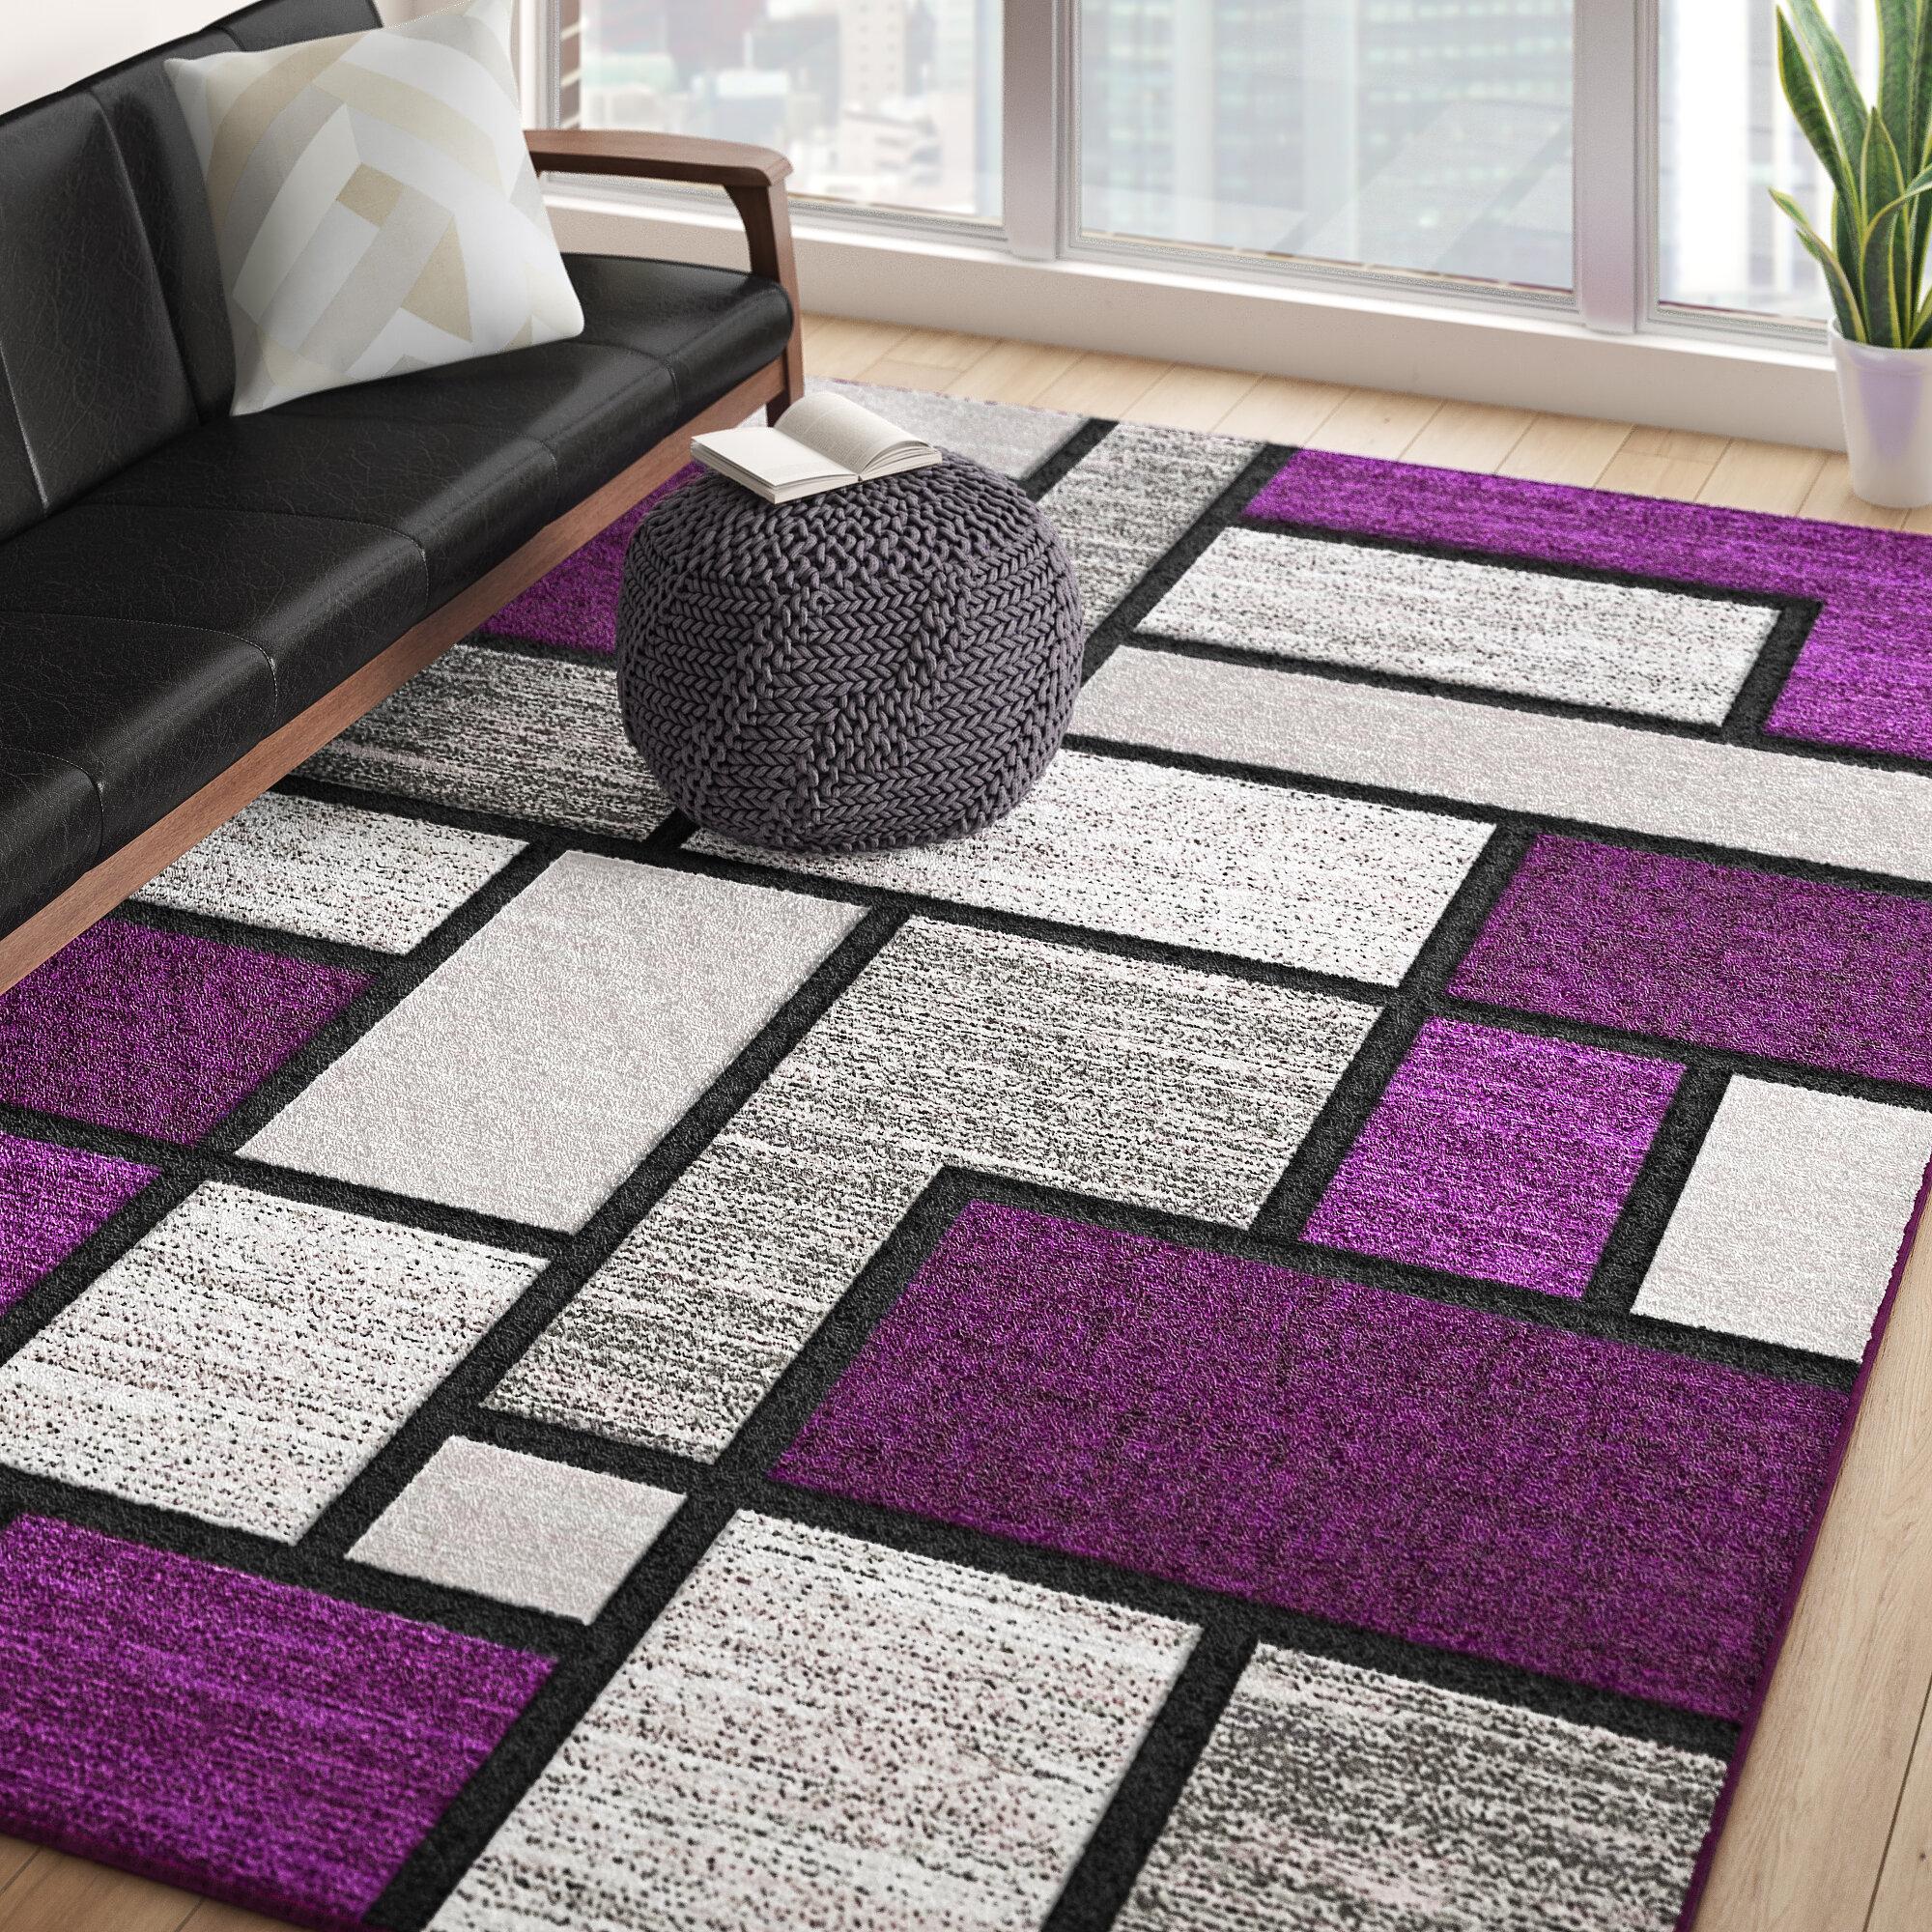 Ivy Bronx Mccampbell Geometric Purple Gray Area Rug Reviews Wayfair